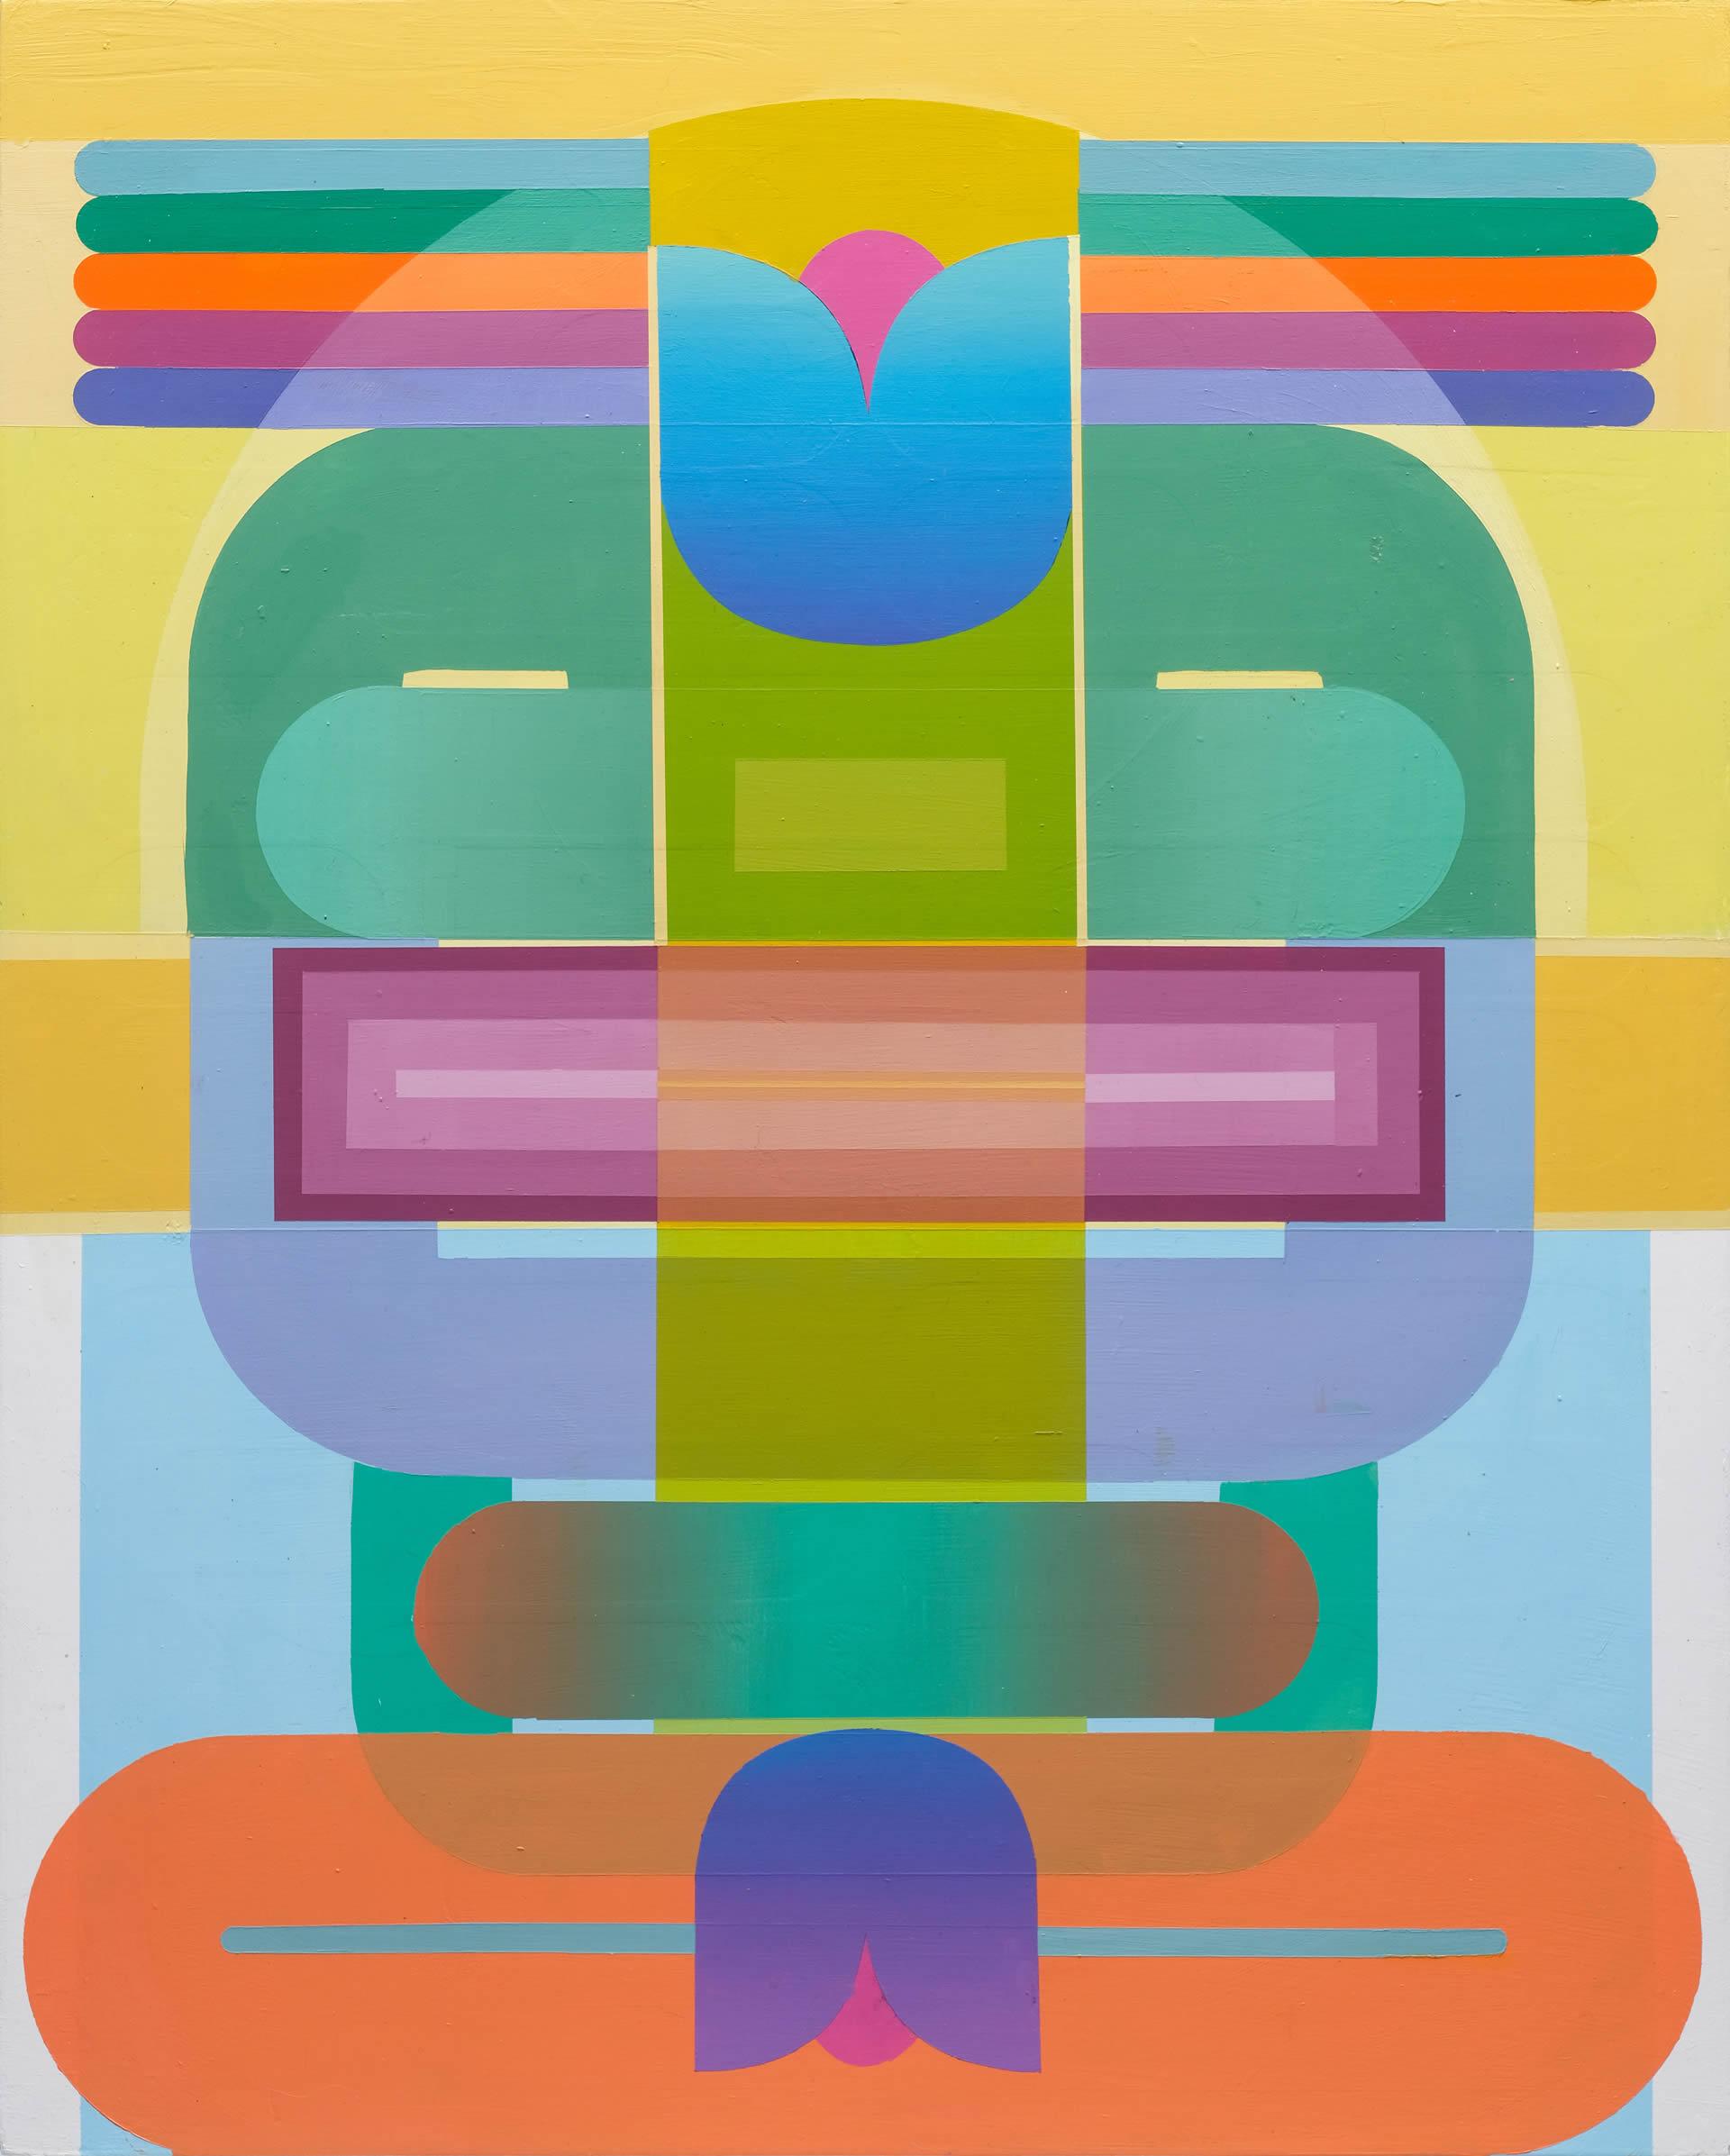 Sarah-Gee-Miller-Optima-3-30x24-Online-Art-Galleries